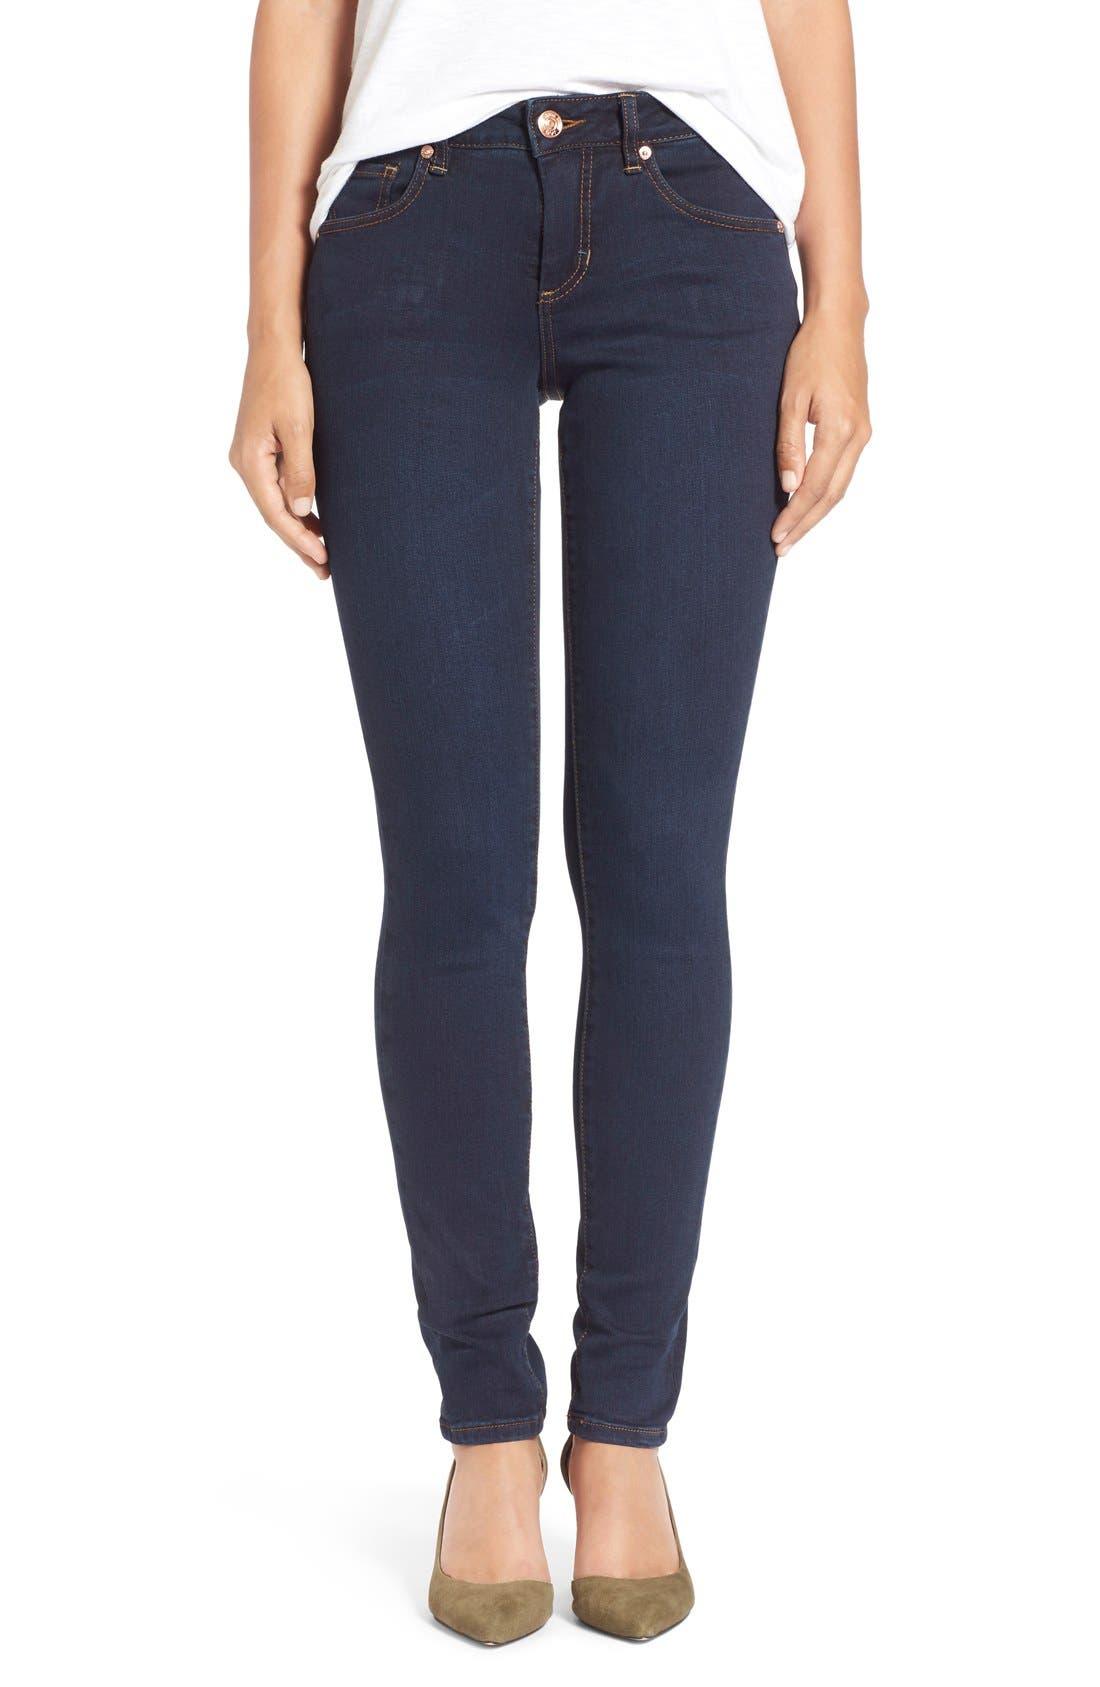 Alternate Image 1 Selected - Jag Jeans'Westlake' StretchSkinnyJeans (Indigo Steel)